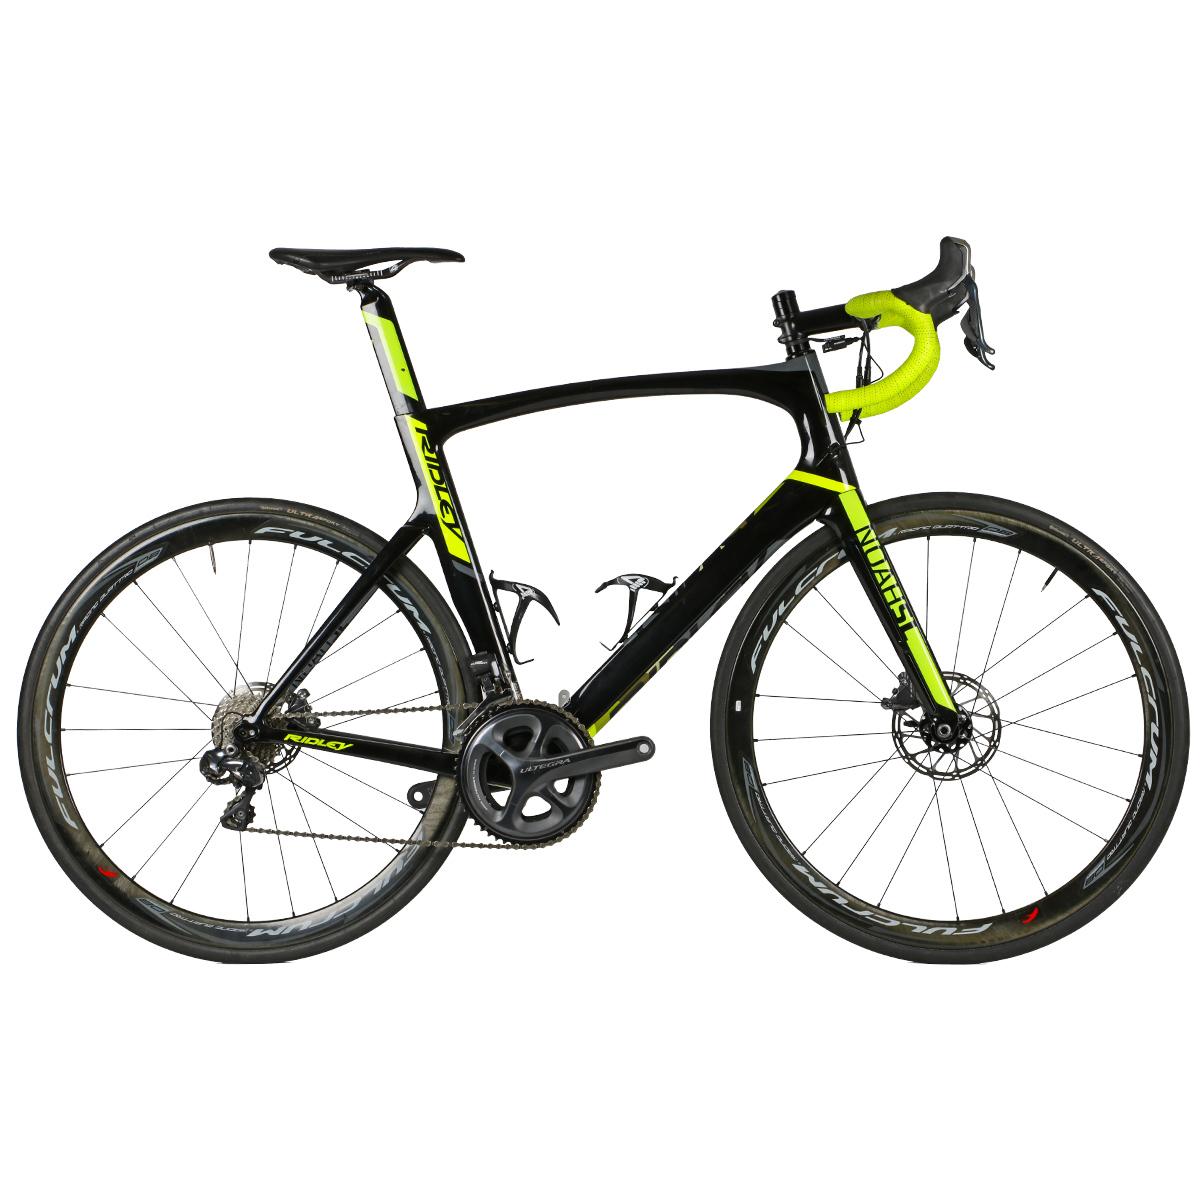 982f253e4f2 Ridley Noah SL Ultegra Di2 Carbon Disc Road Bike - Ex Demo. Full Screen